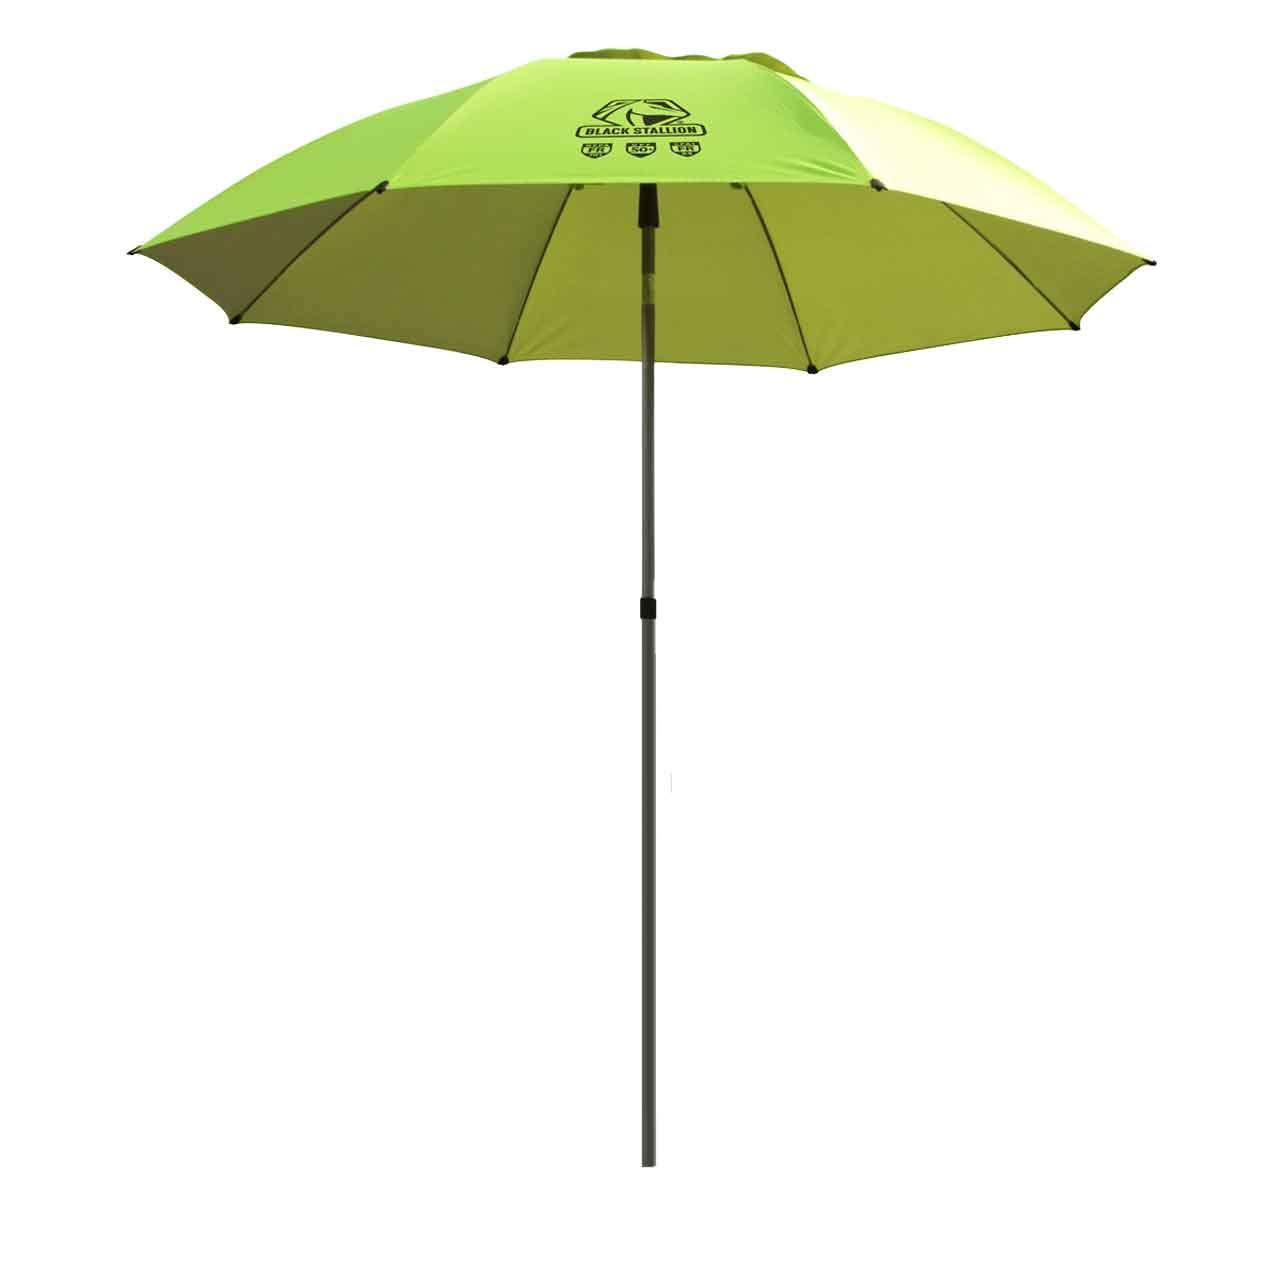 Black Stallion UB200 Core Flame-Resistant Industrial Umbrella, Hi-Vis Yellow/Lime by Black Stallion